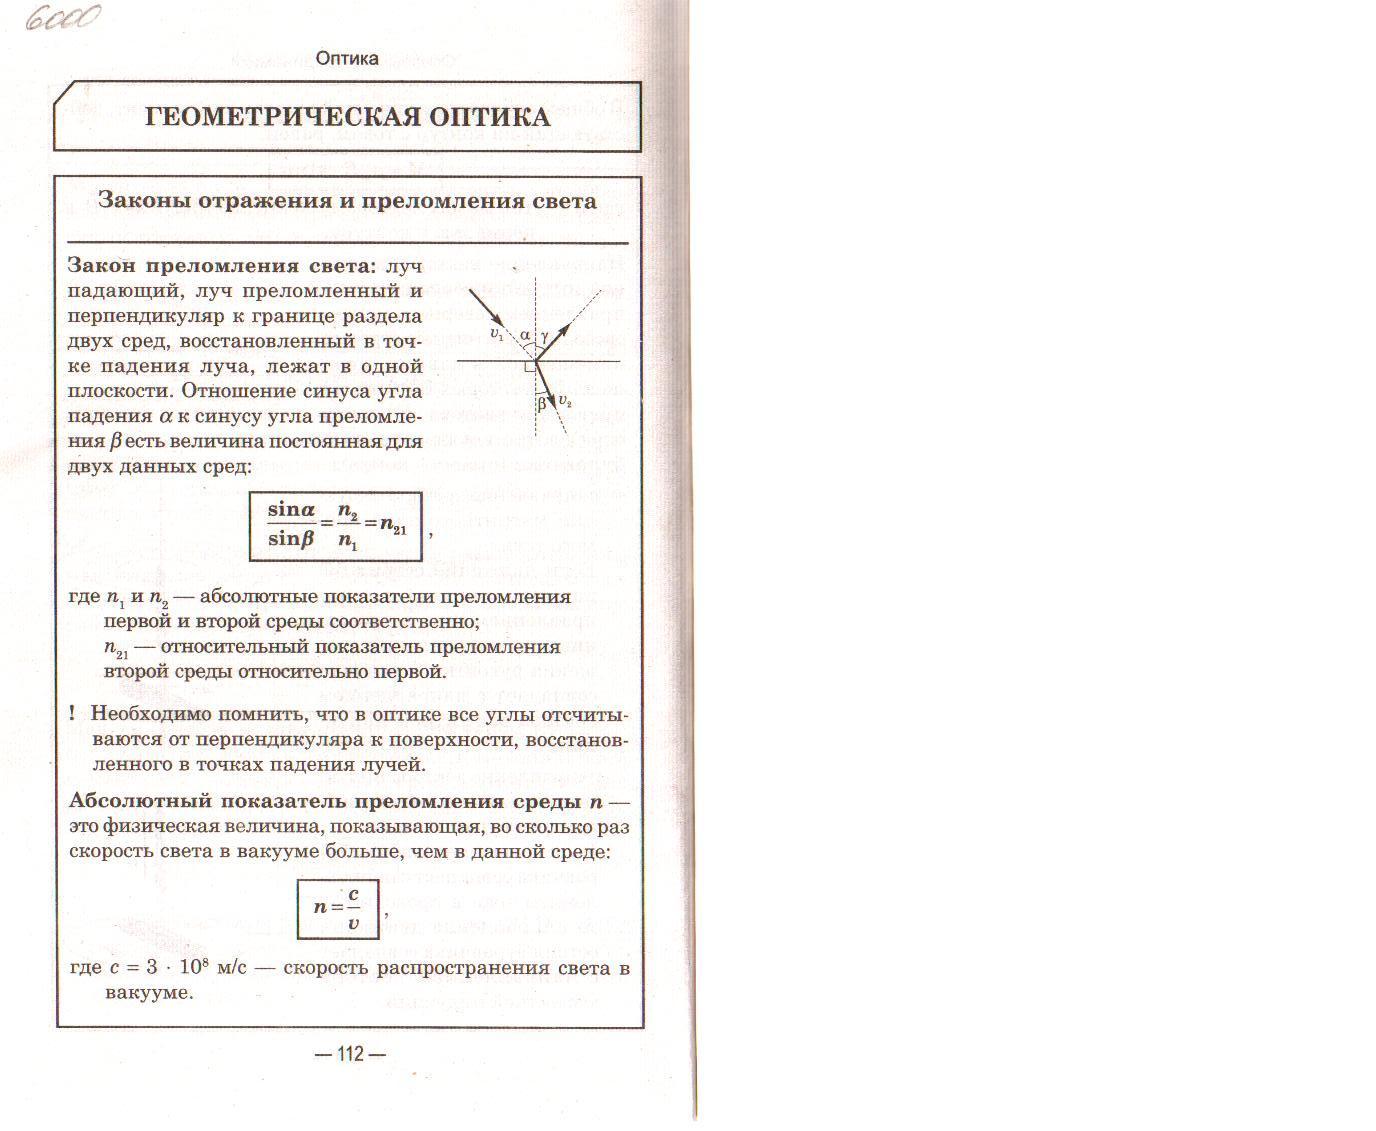 Решебник по физике 10 класс. Страницы 17